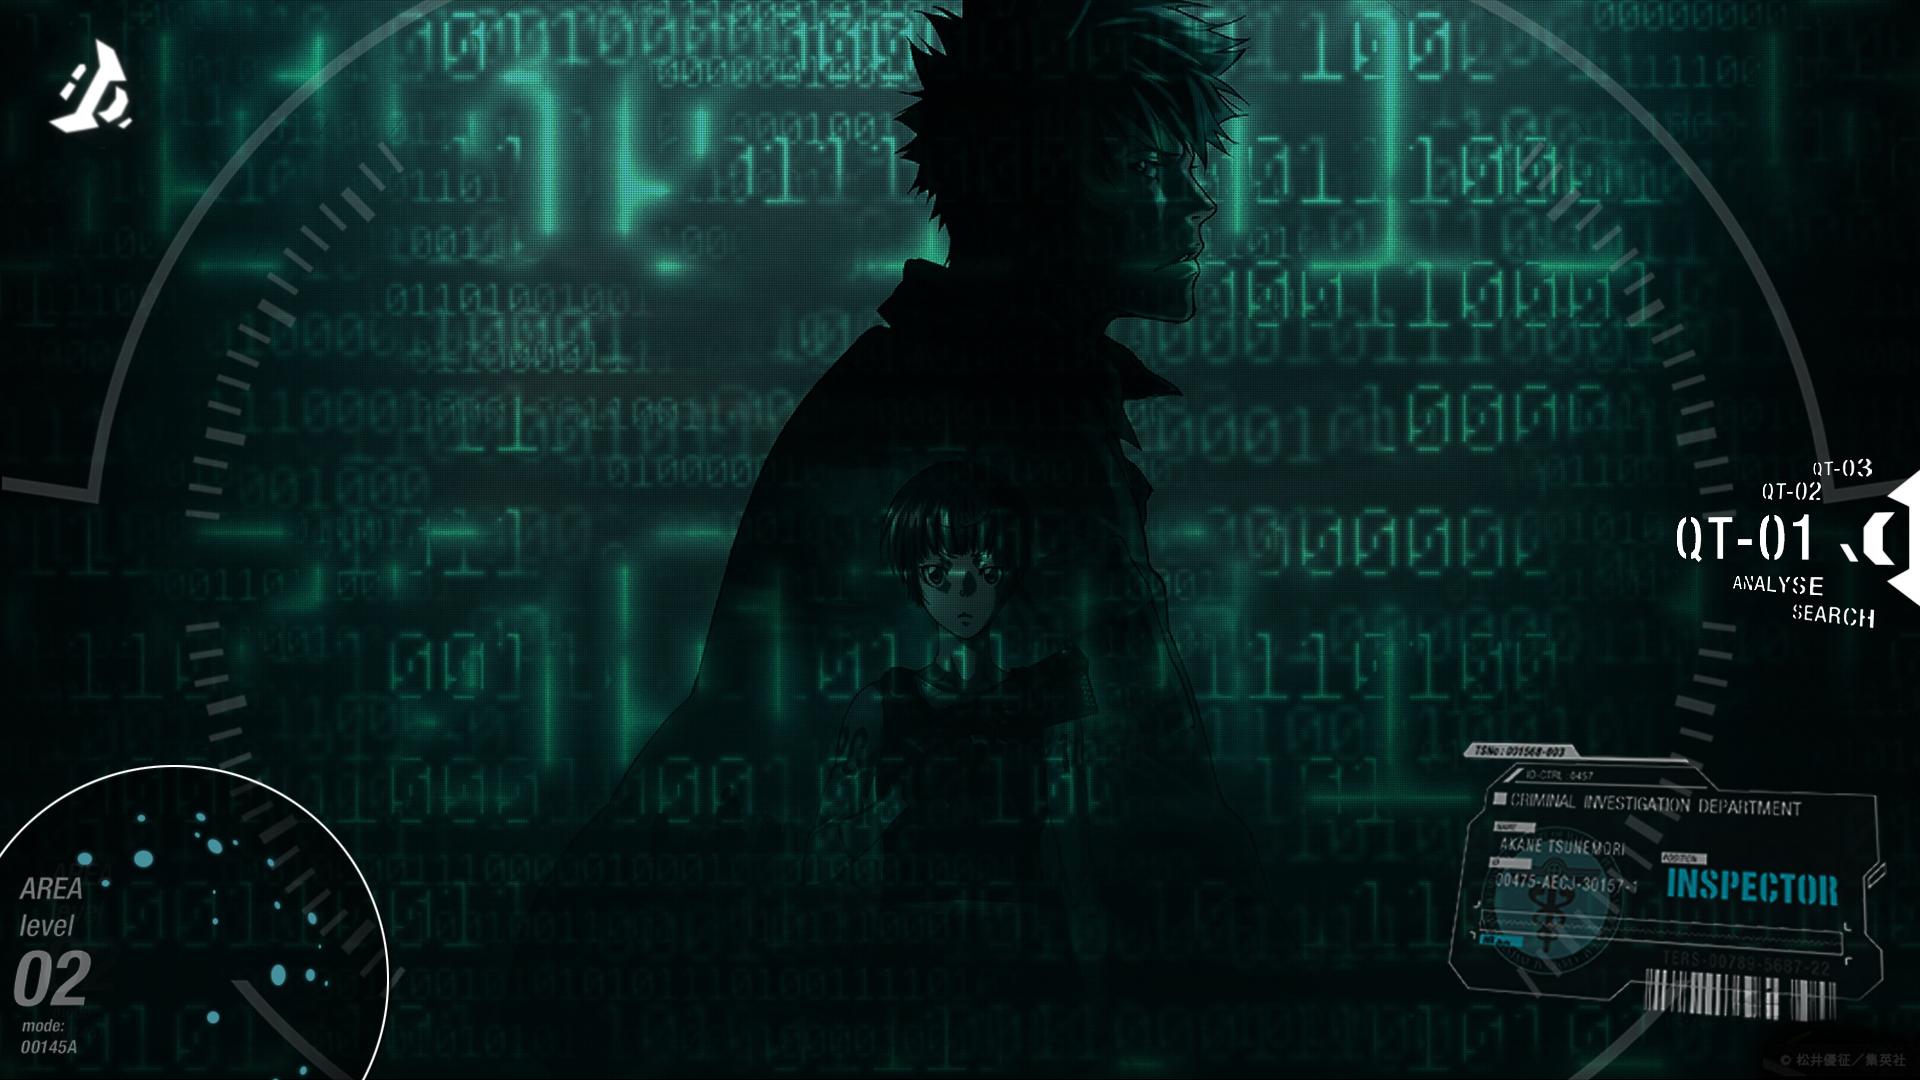 Psycho Pass Wallpaper By Animecitationsquotes On Deviantart